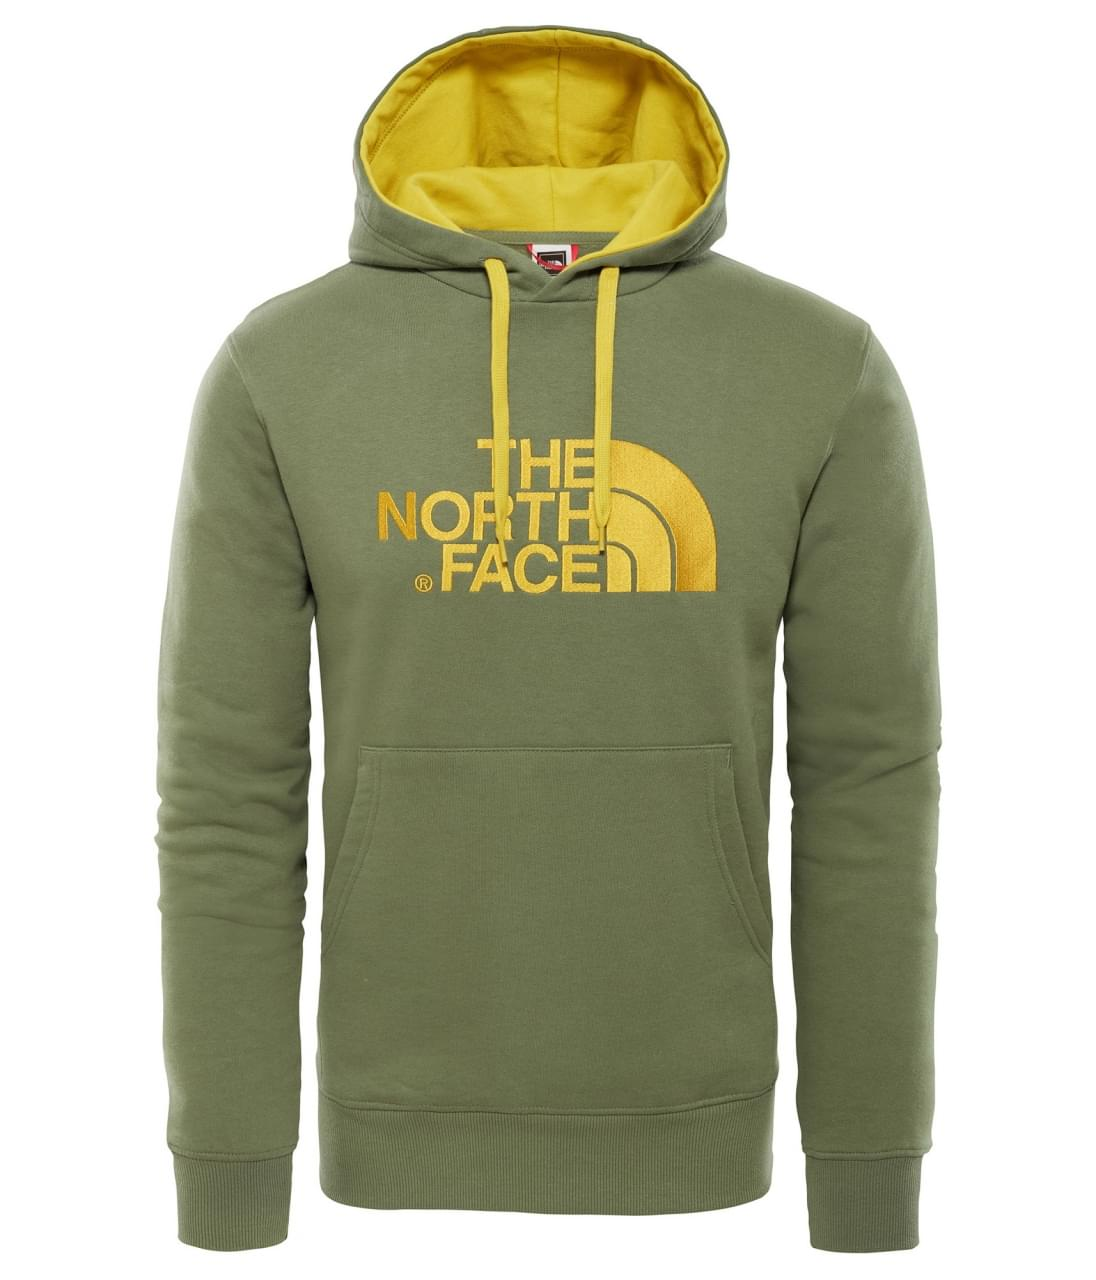 The North Face Drew Peak Pullover Hoodie Trui Heren